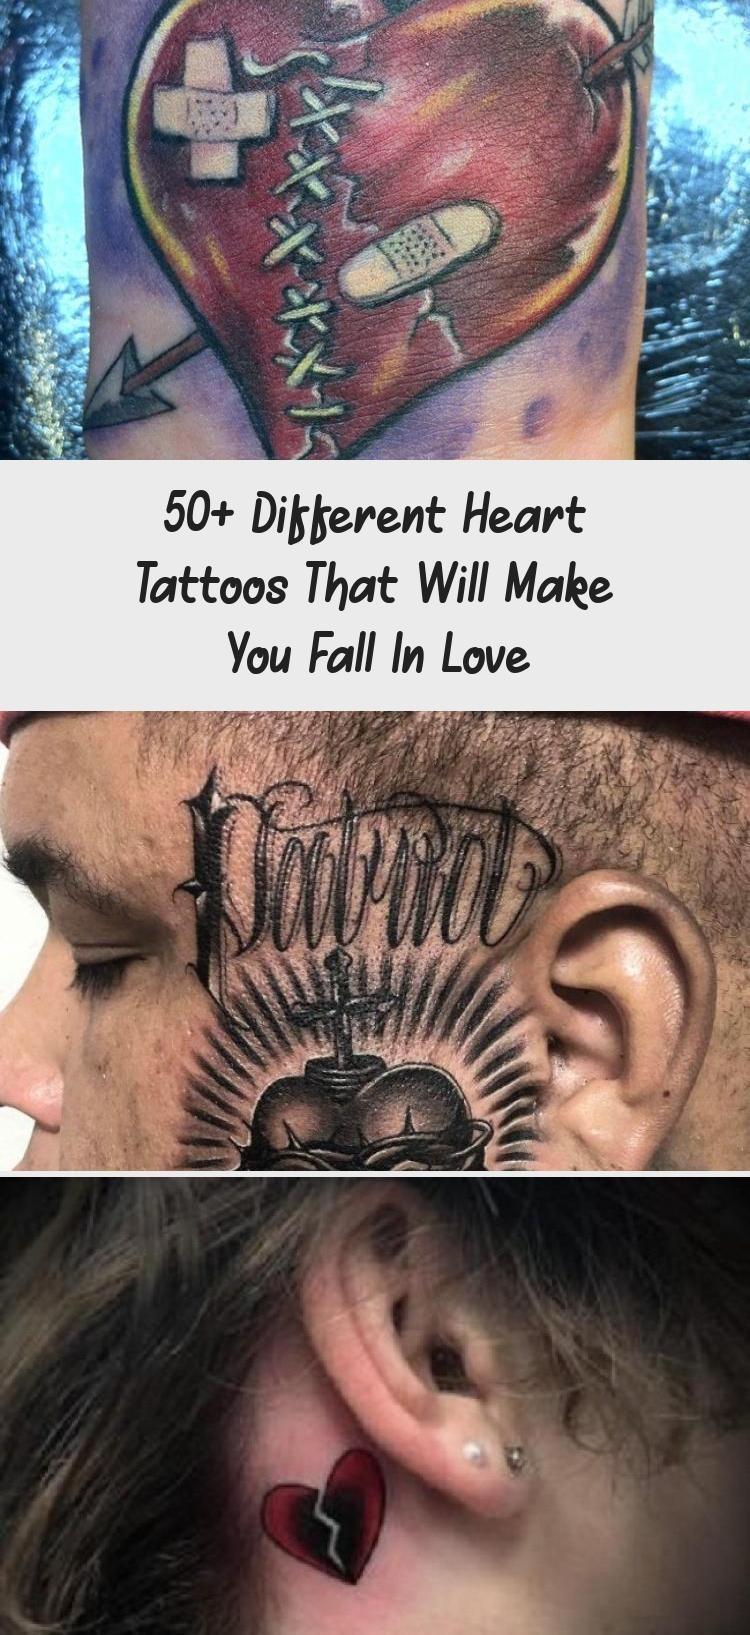 Celtic Heart Tattoo Hearttattooplacement Hearttattoohip Littlehearttattoo Realistichearttattoo Heart In 2020 Heart Tattoo Black Heart Tattoos Sacred Heart Tattoos